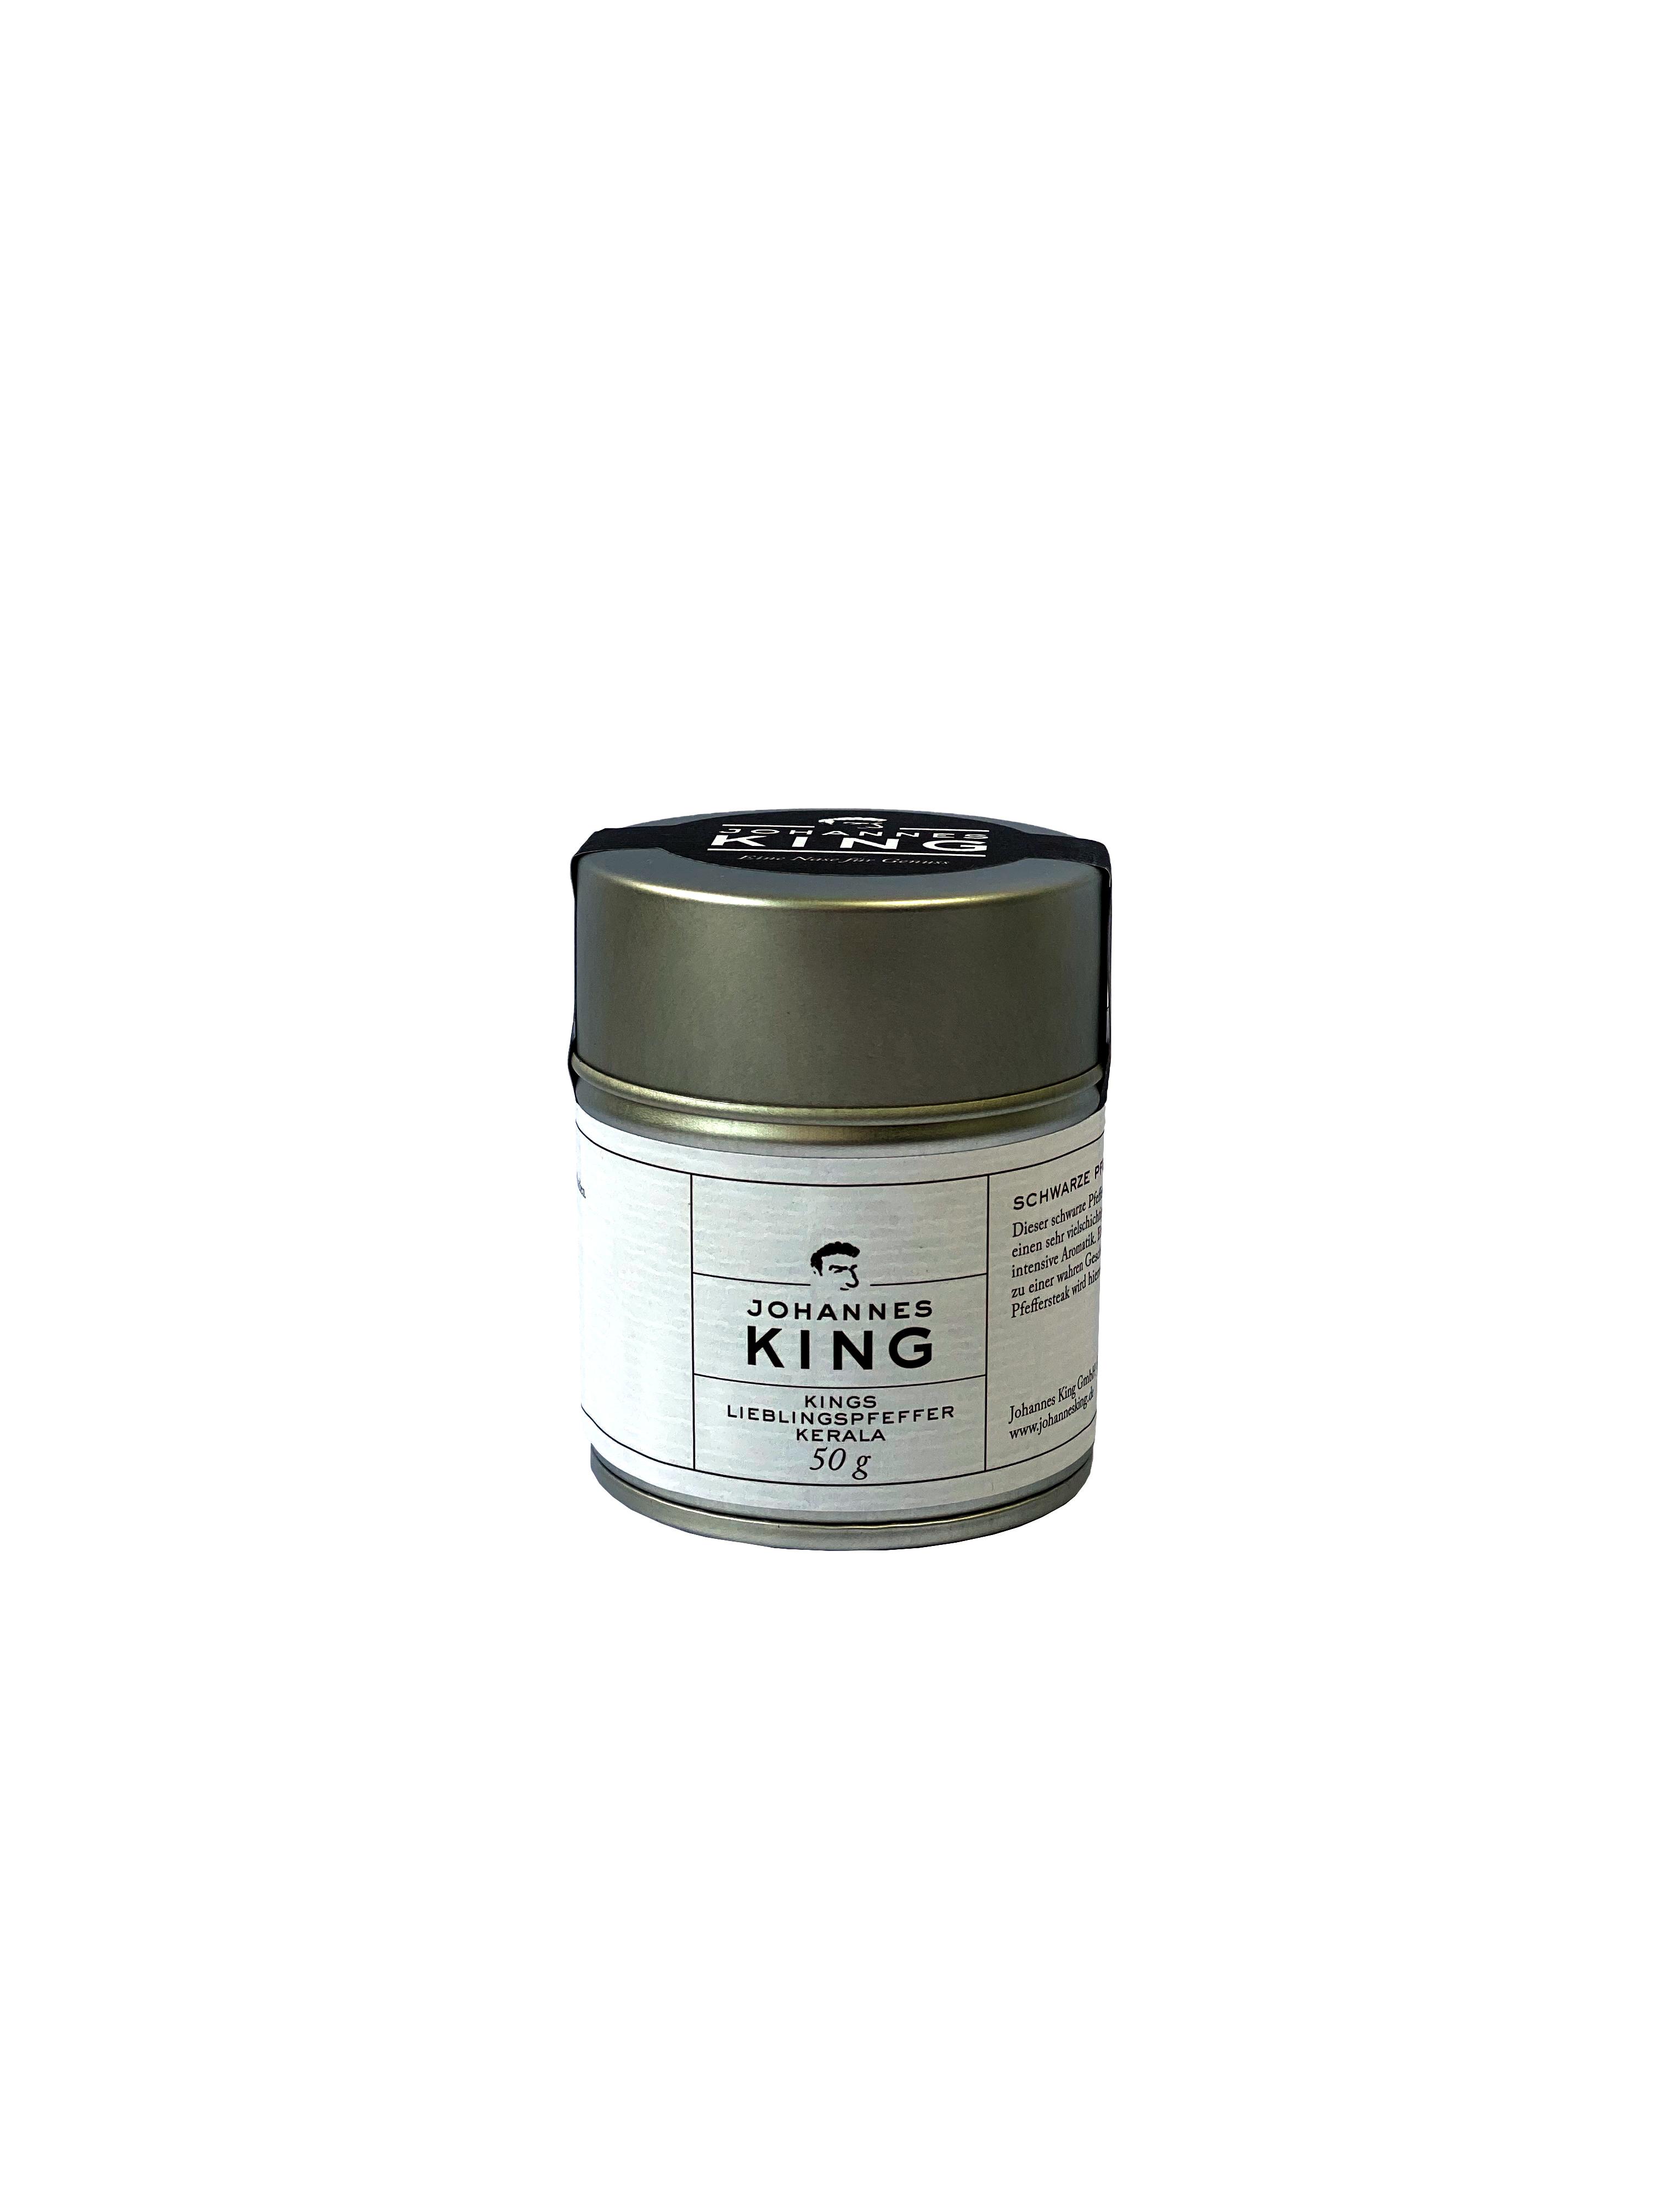 Kings Kleines Champagner-Rendezvous